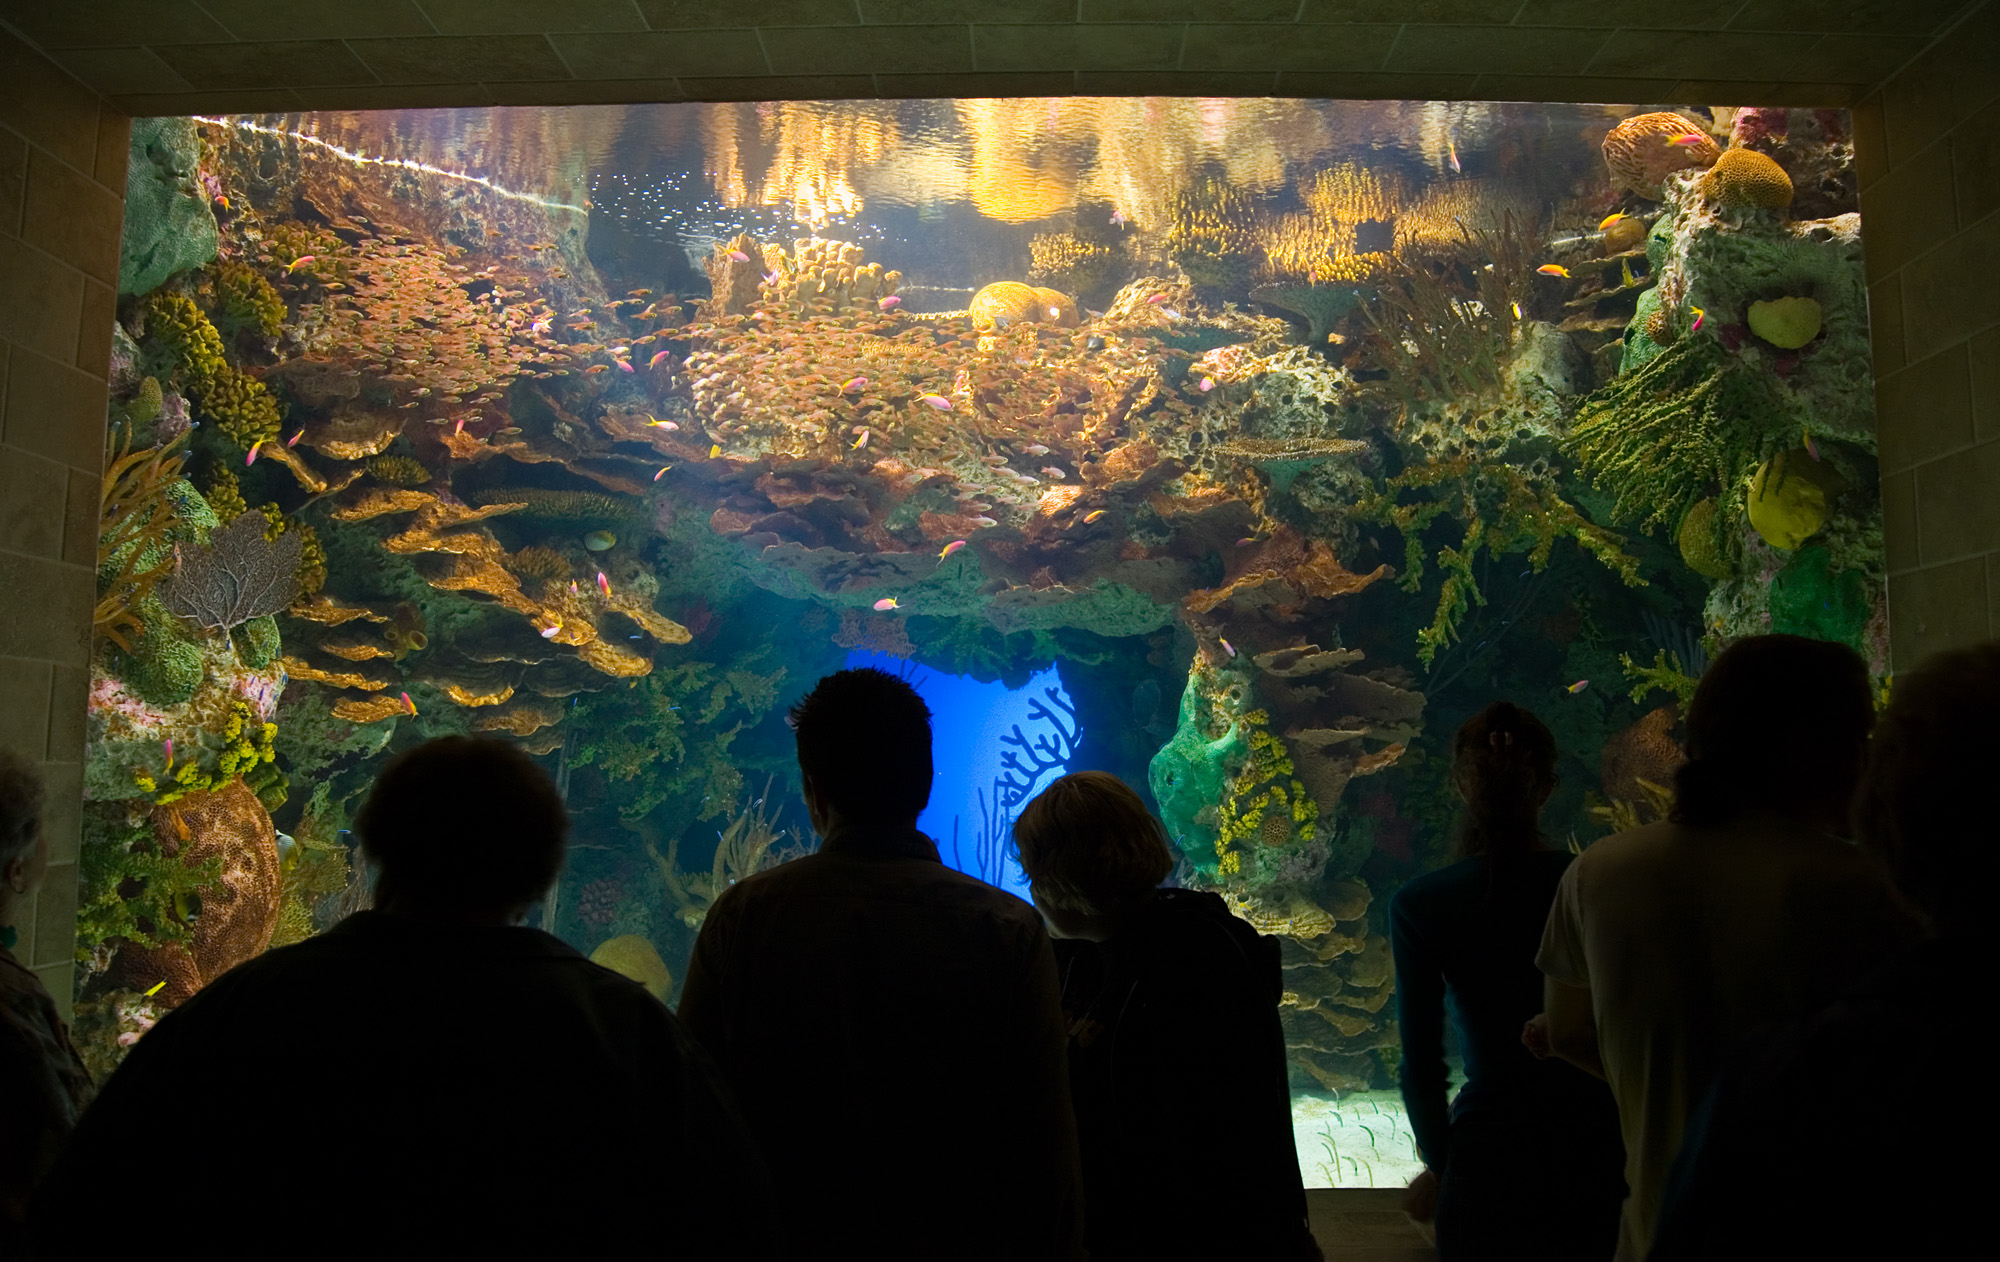 ... fish vivarium displaying 19 images for fish vivarium toolbar creator 10 Gallon Vivarium